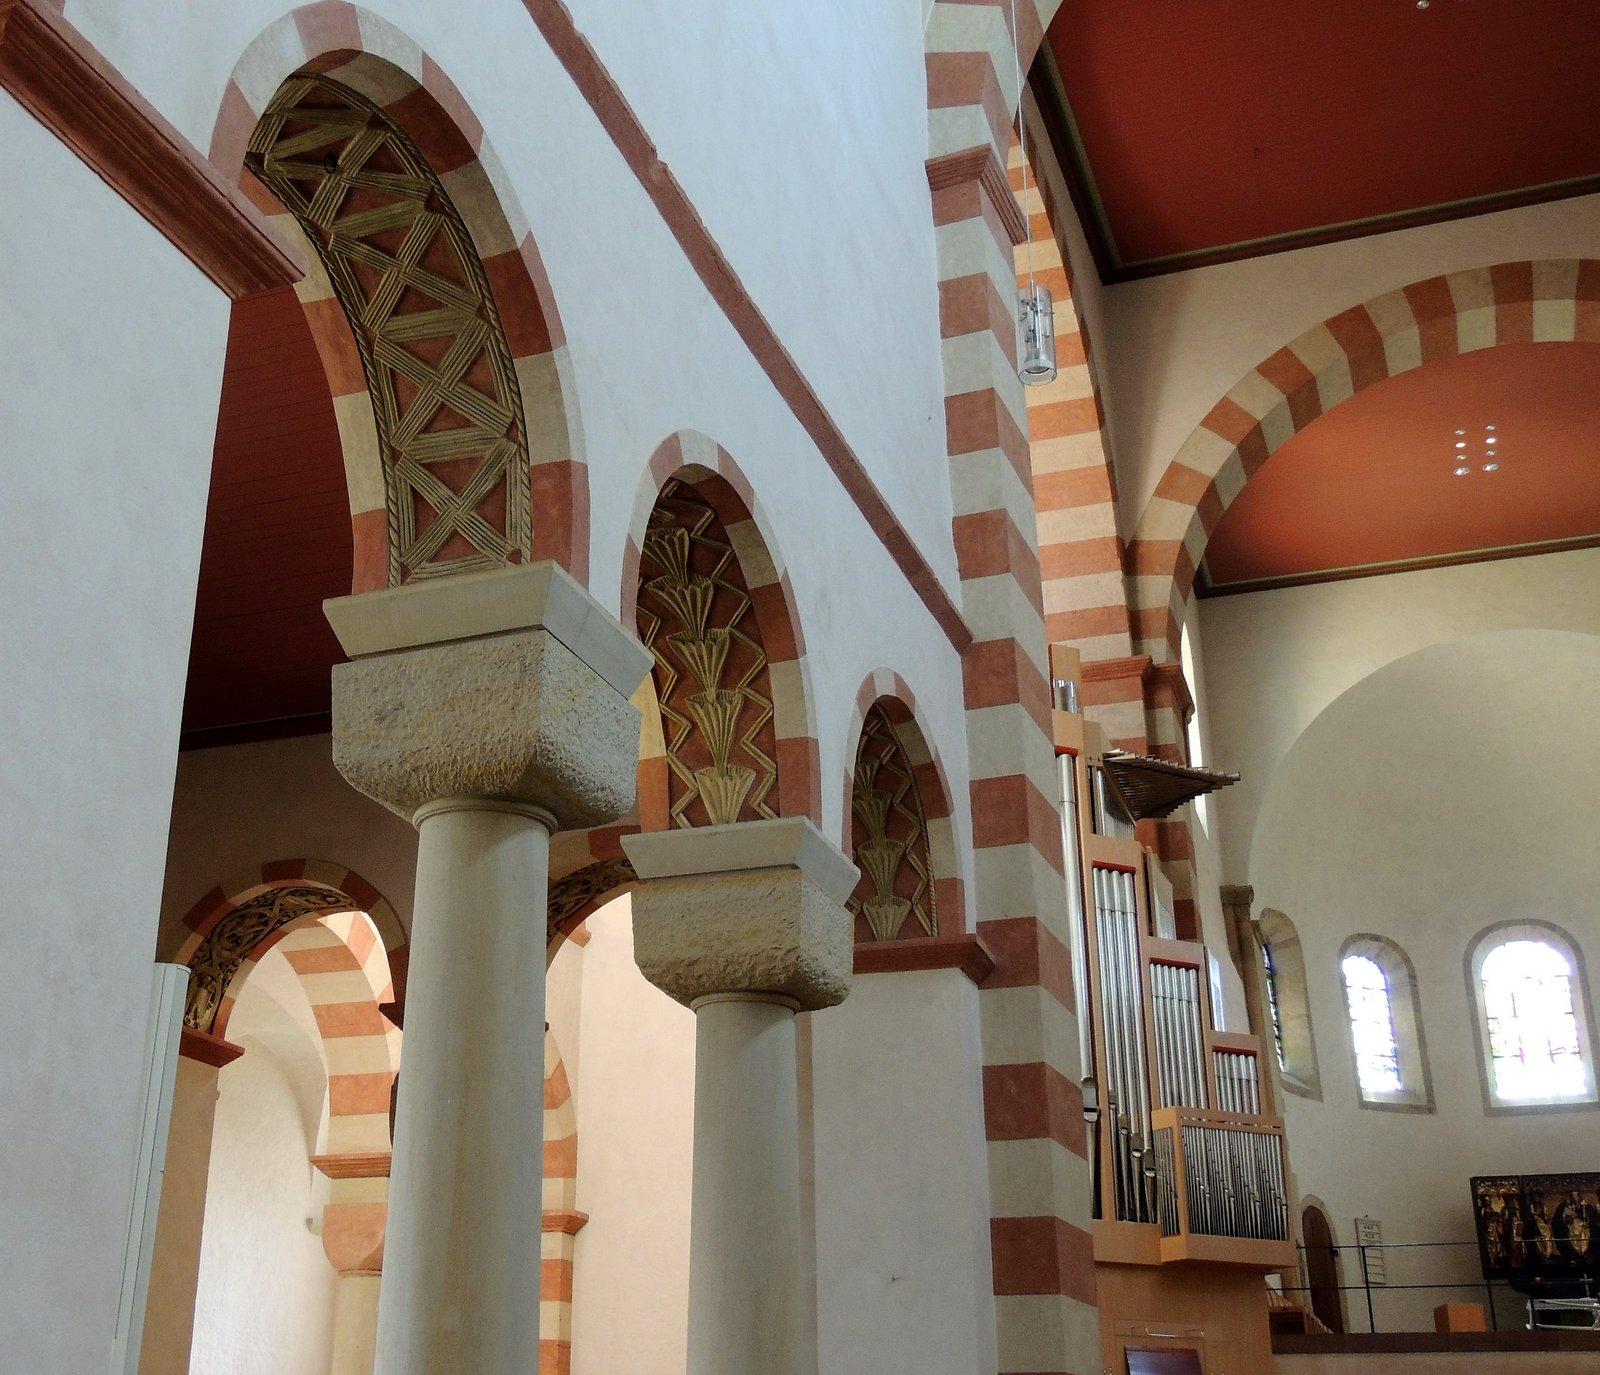 Kirche St. Michaelis Hildesheim